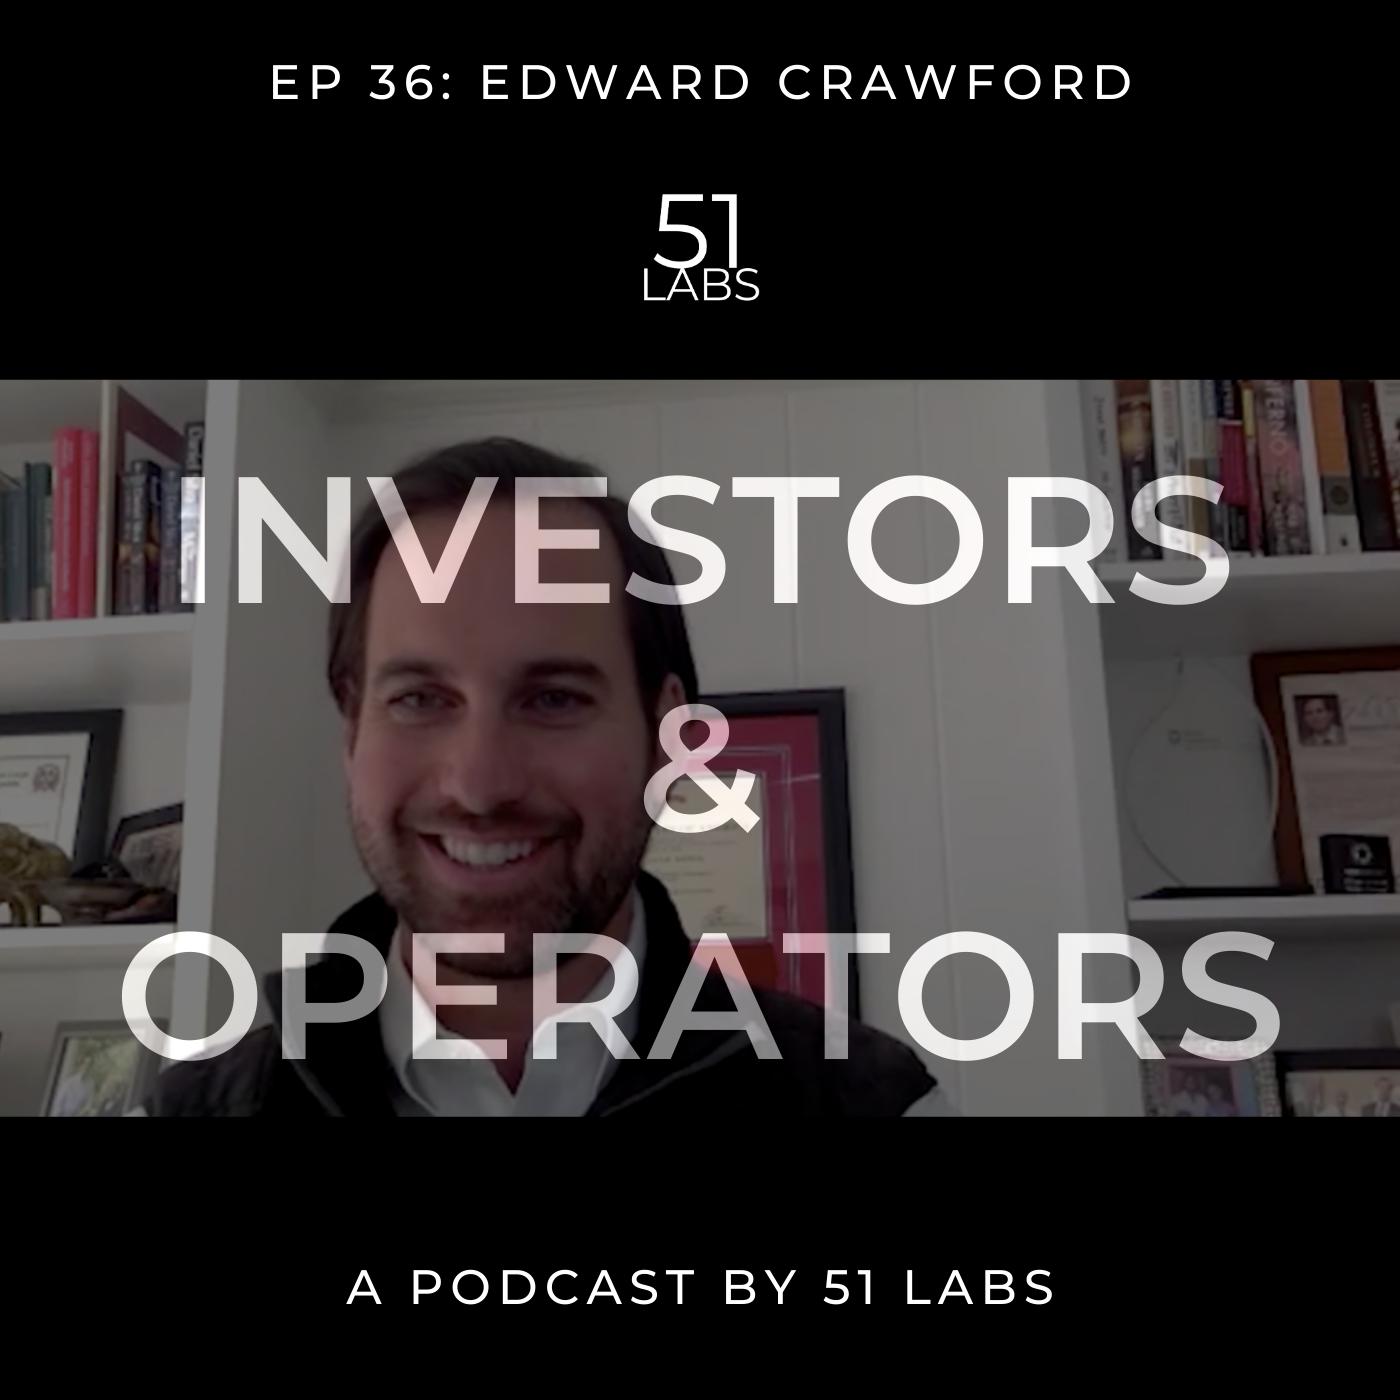 Artwork for podcast Investors & Operators